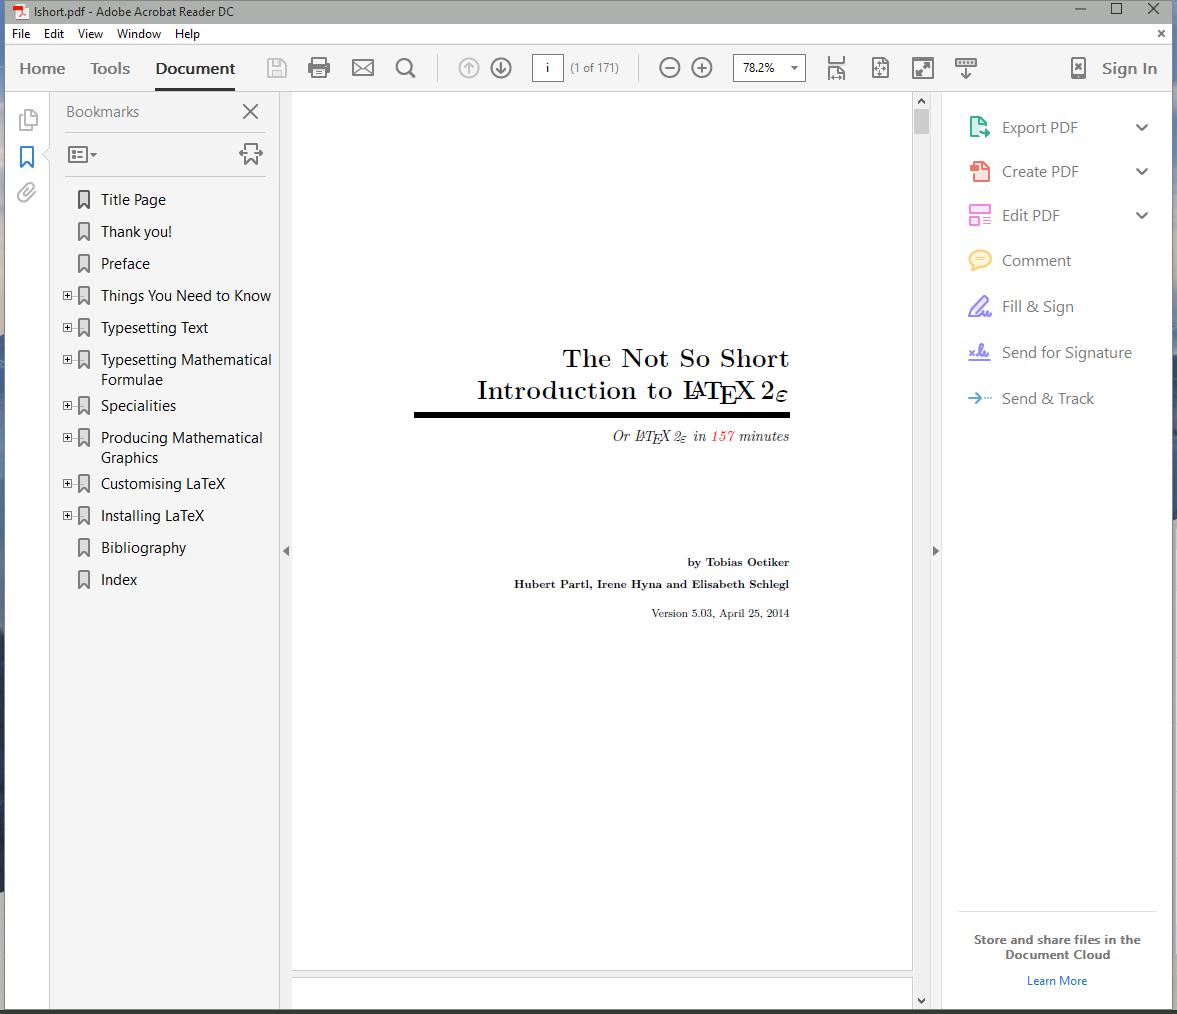 10 Best PDF Reader for iPad